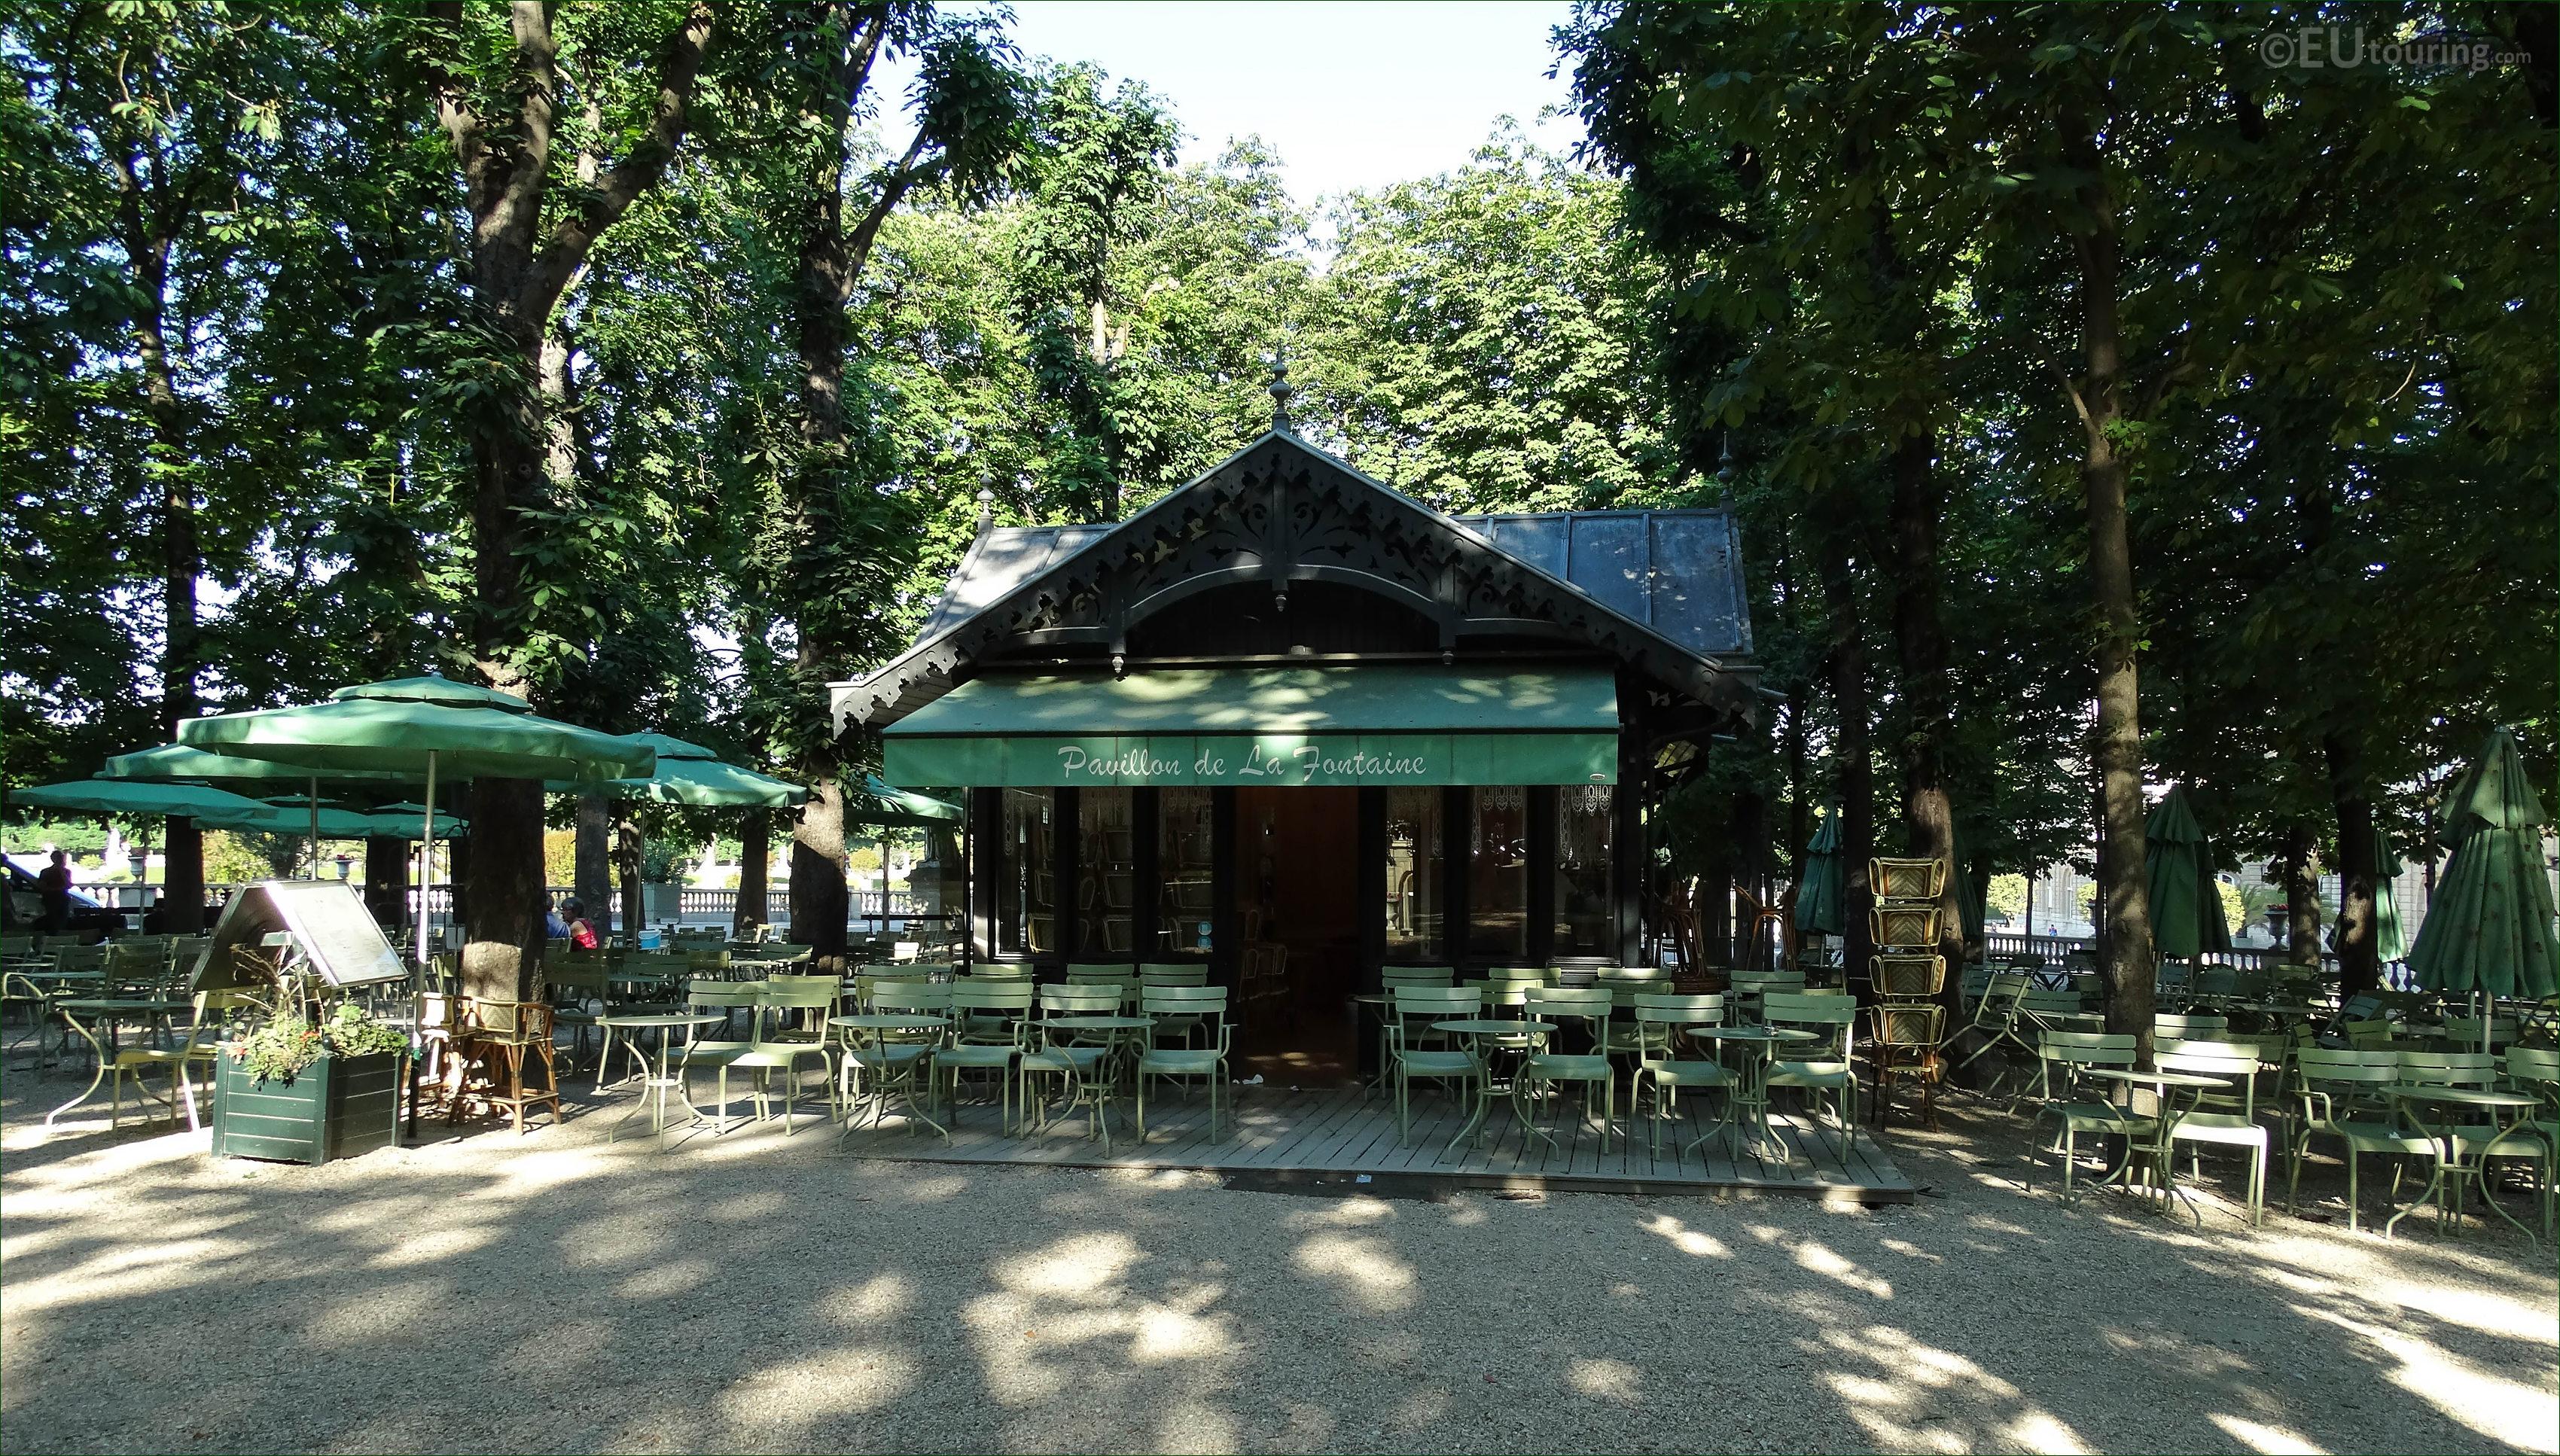 Photos of Jardin du Luxembourg public gardens in Paris